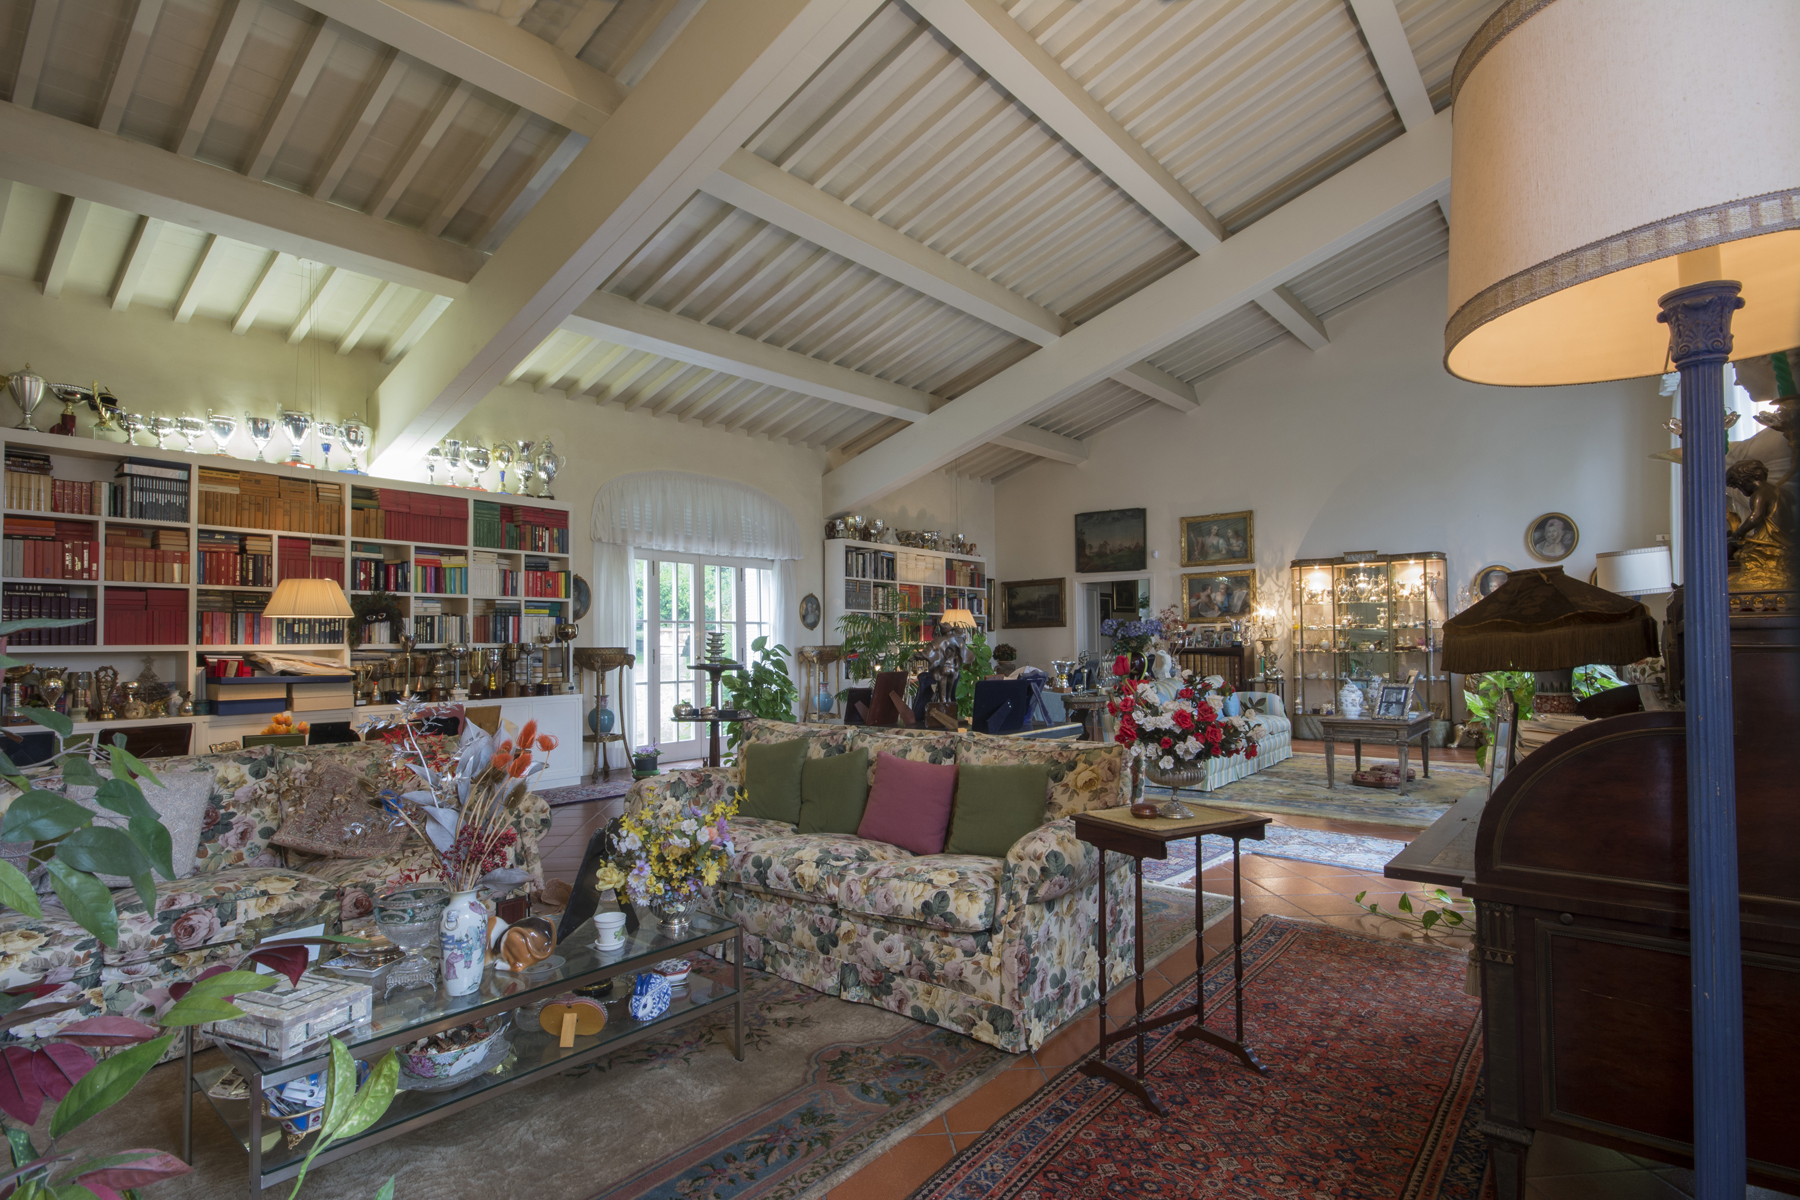 Villa in Vendita a Lucca: 5 locali, 2451 mq - Foto 11